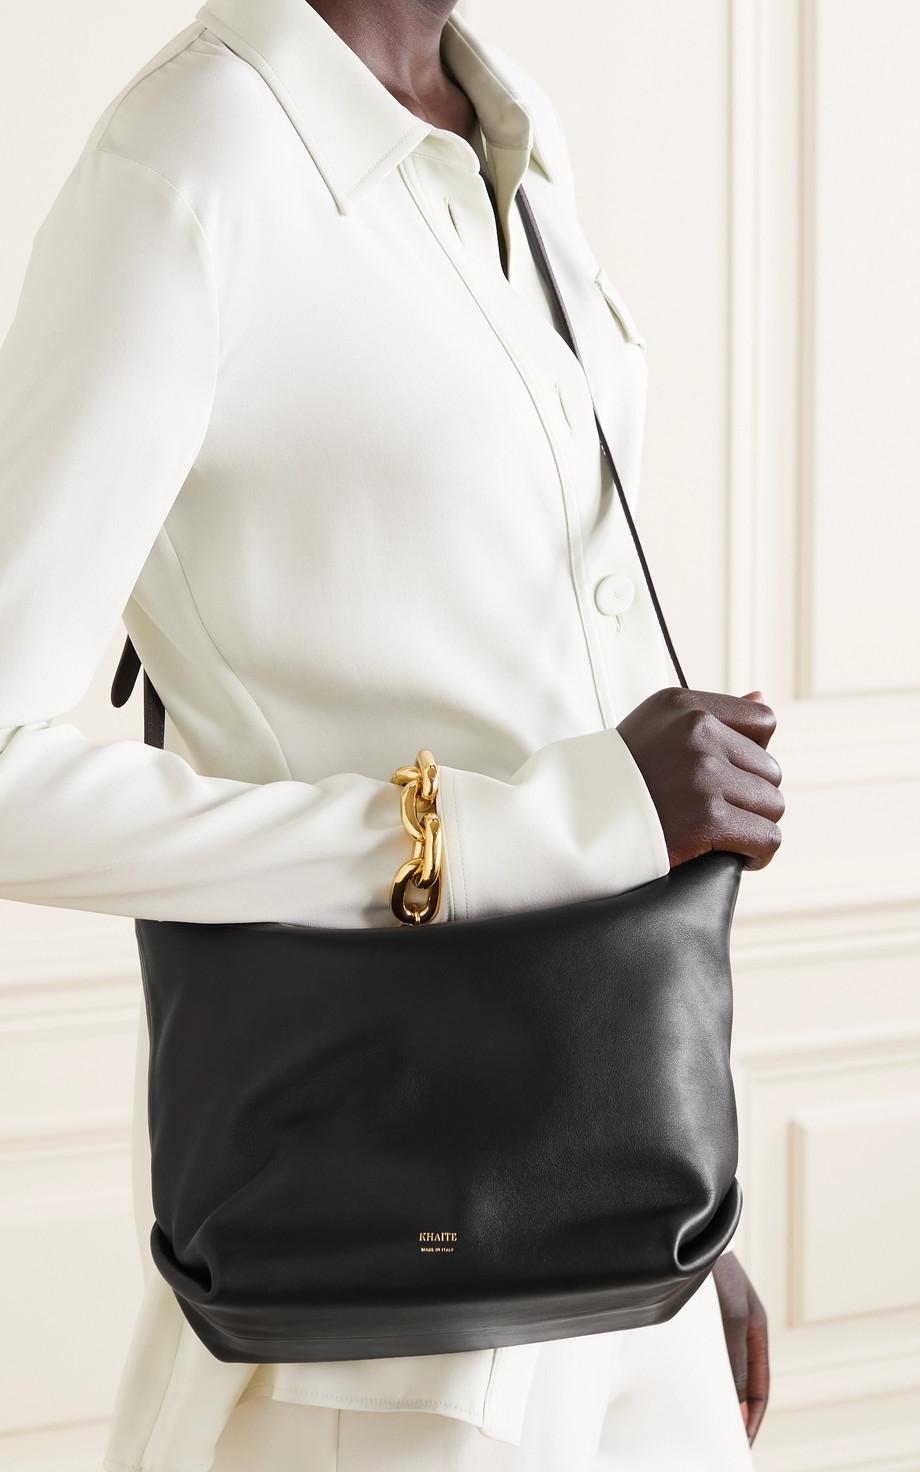 Khaite Frances leather shoulder bag